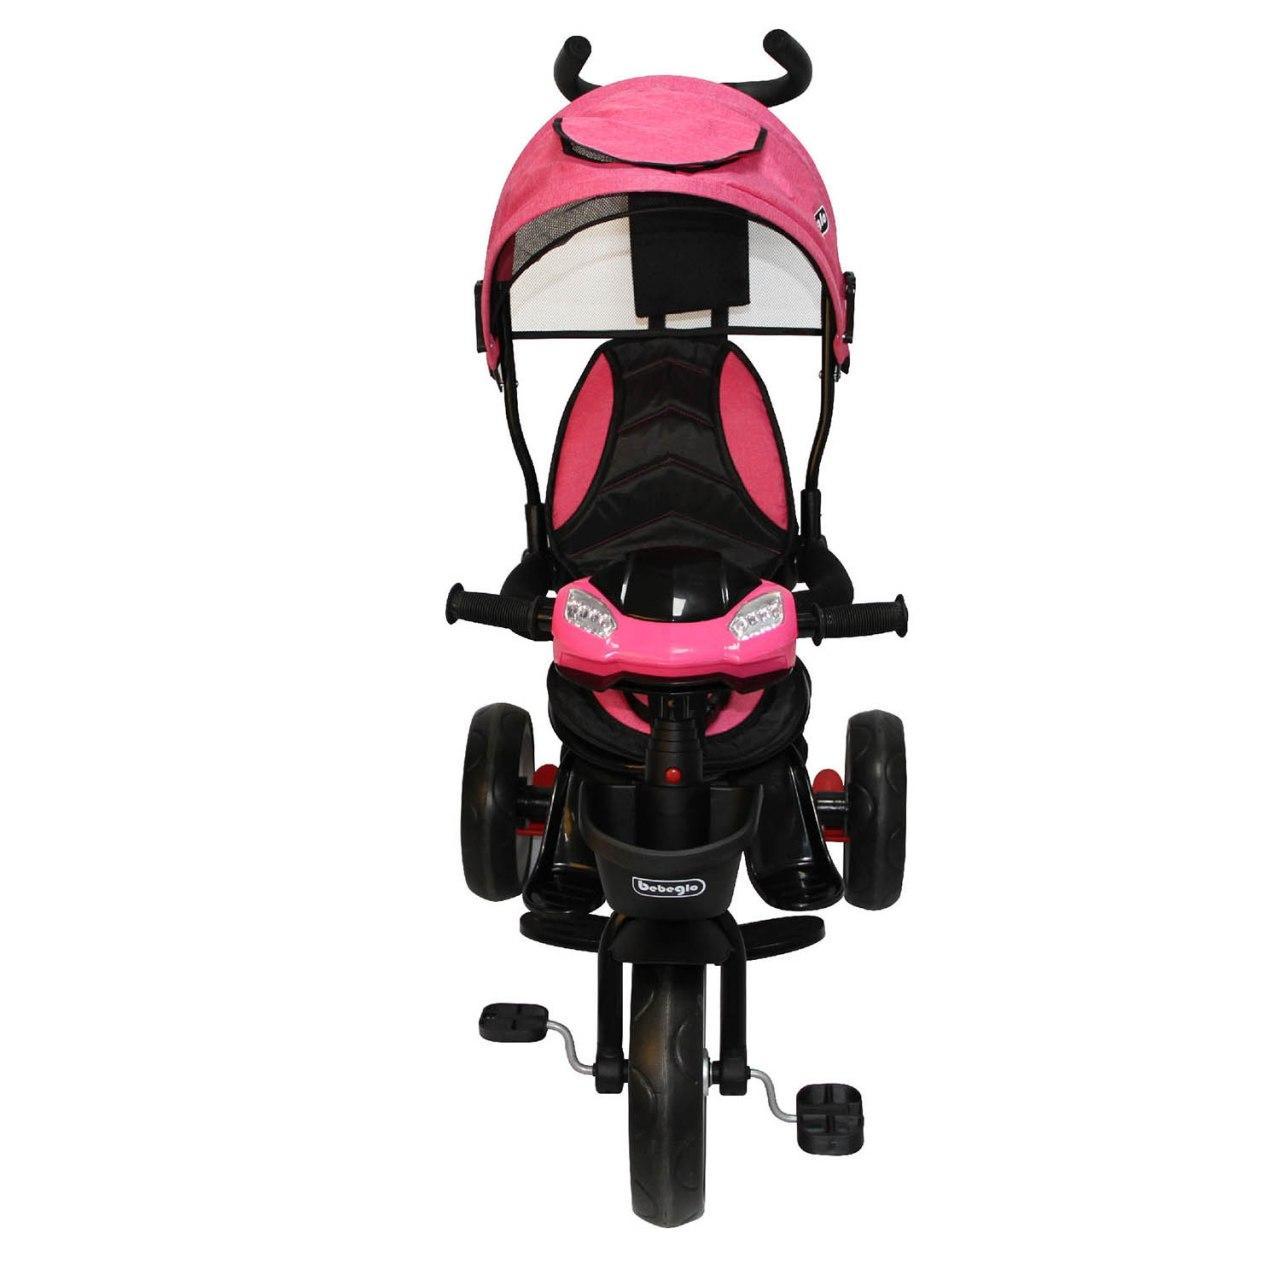 Triciclo Bebeglo Bluetooth One Click - Fucsia